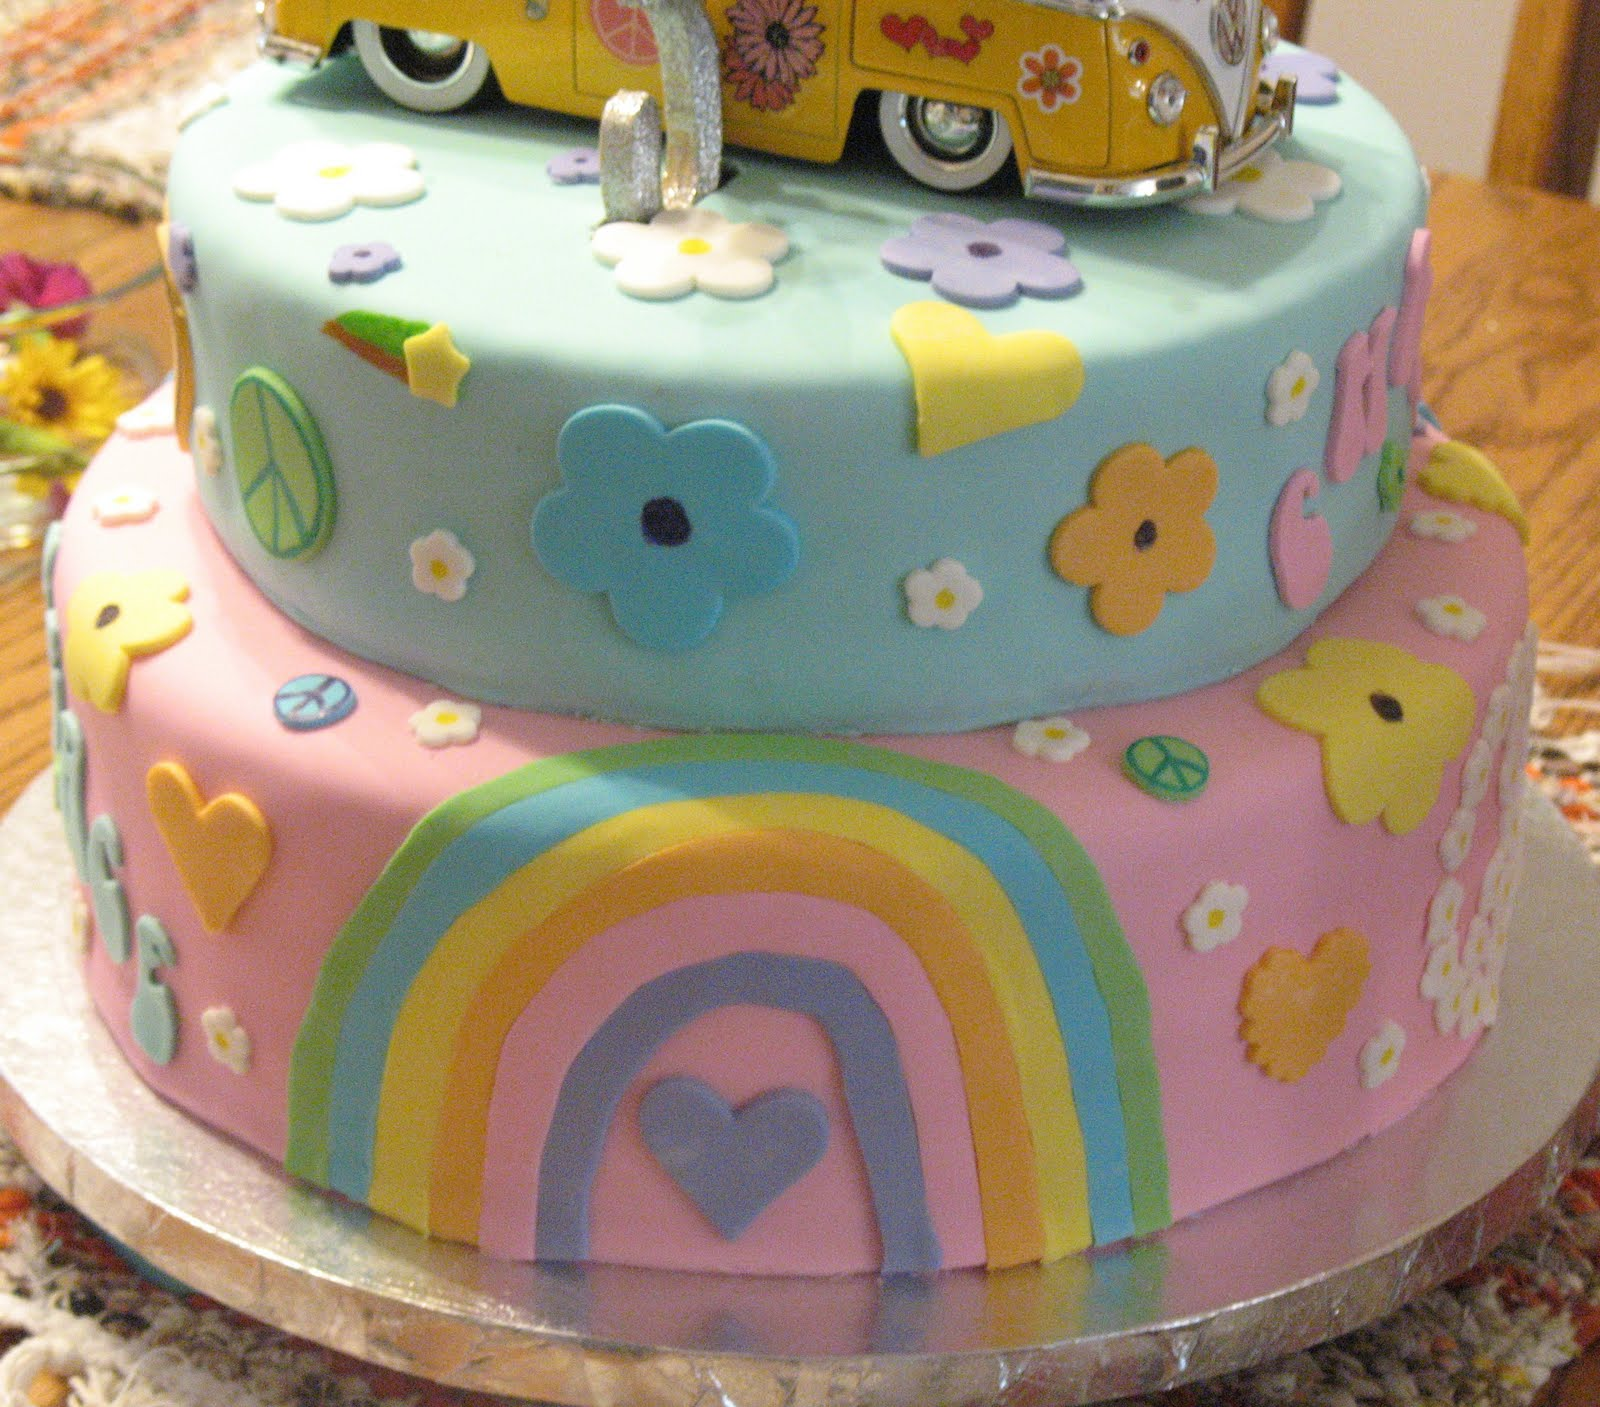 J's Cakes: Hippie Cake